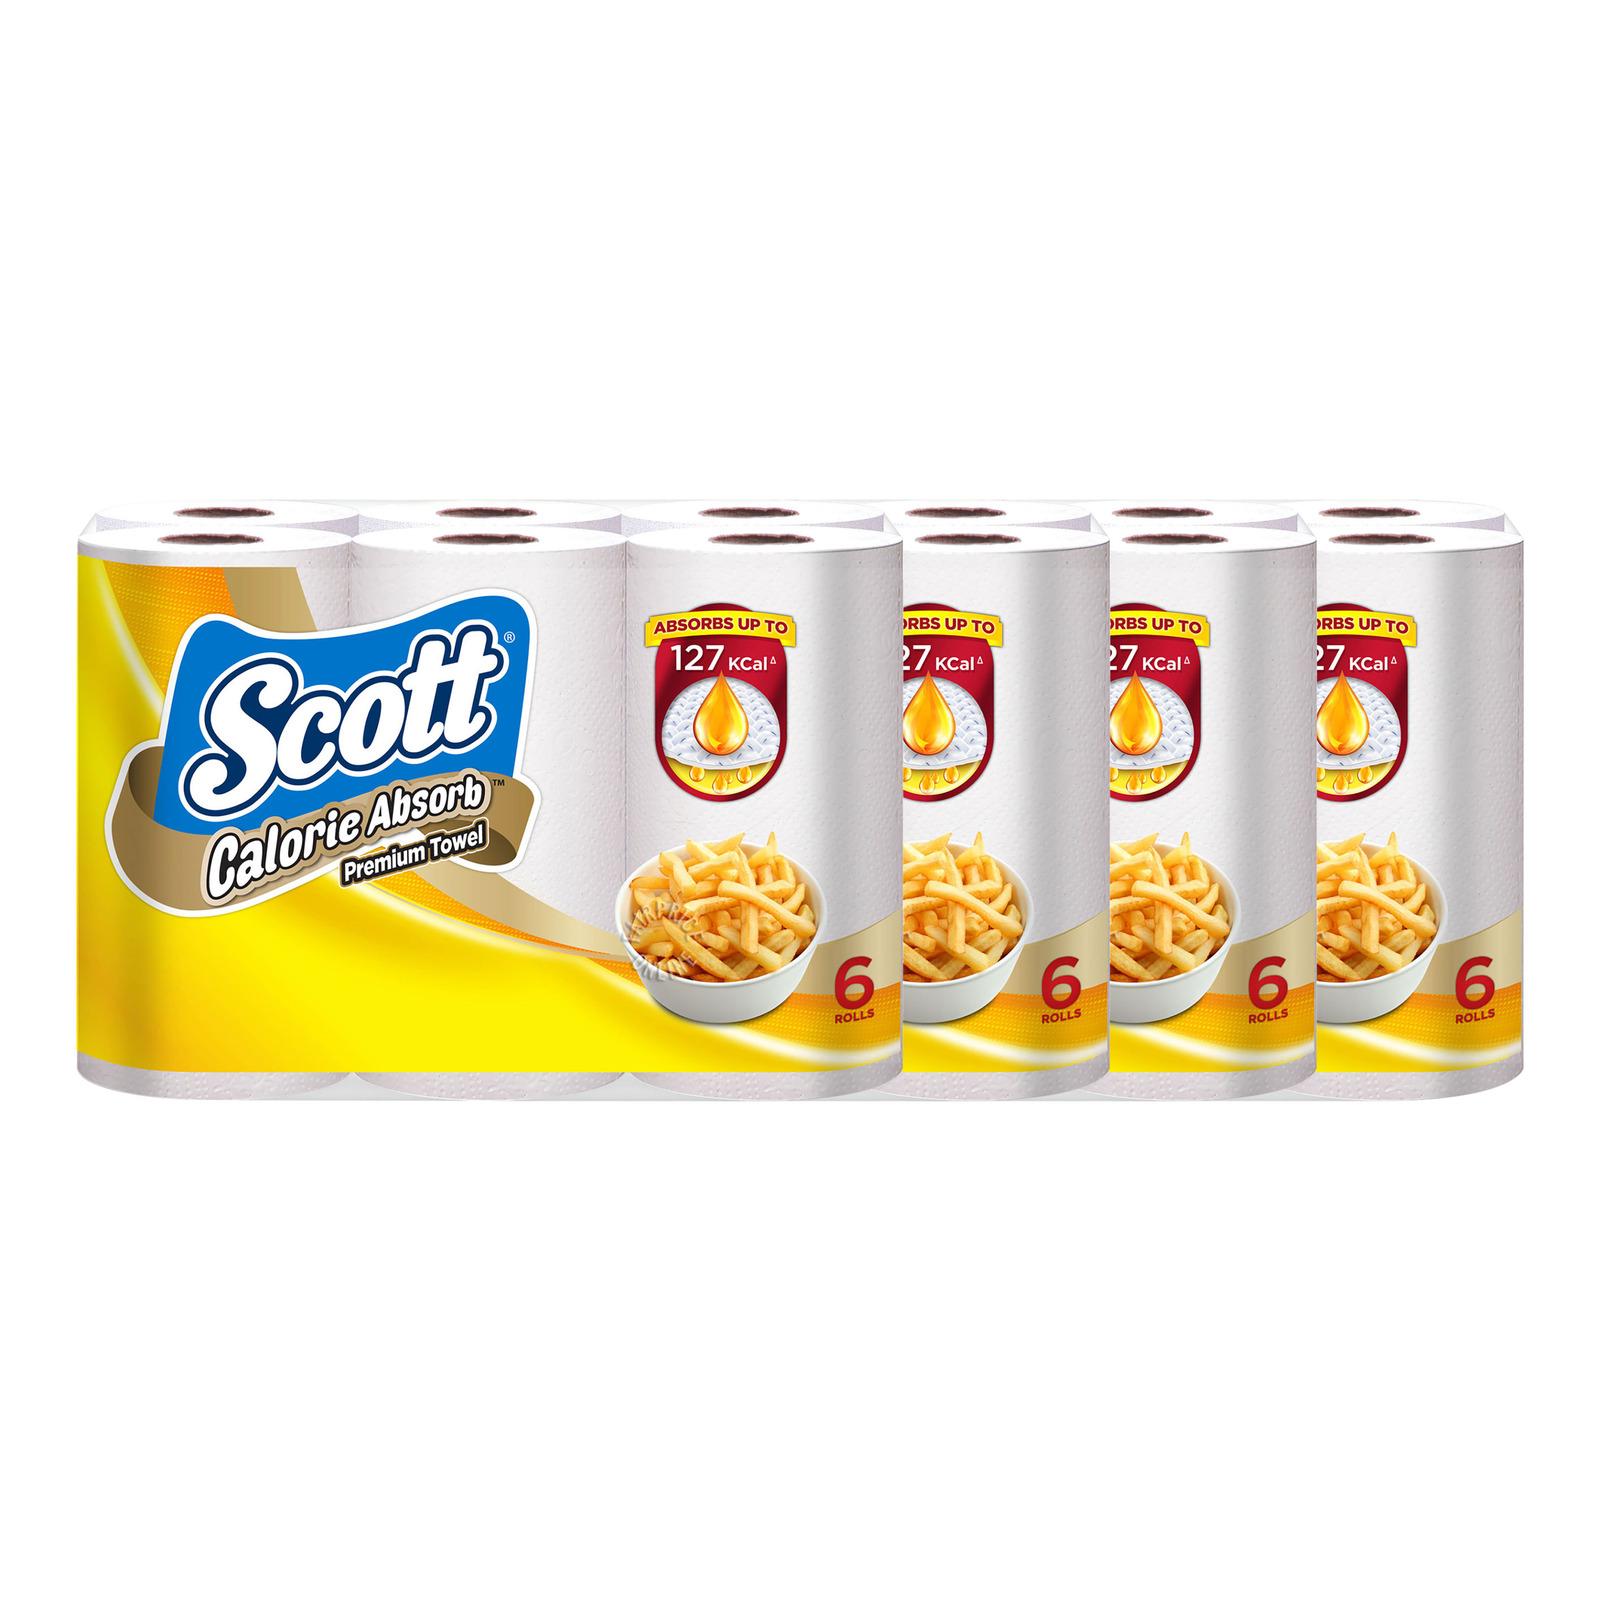 Scott Kitchen Premium Towel Rolls - Calorie Light